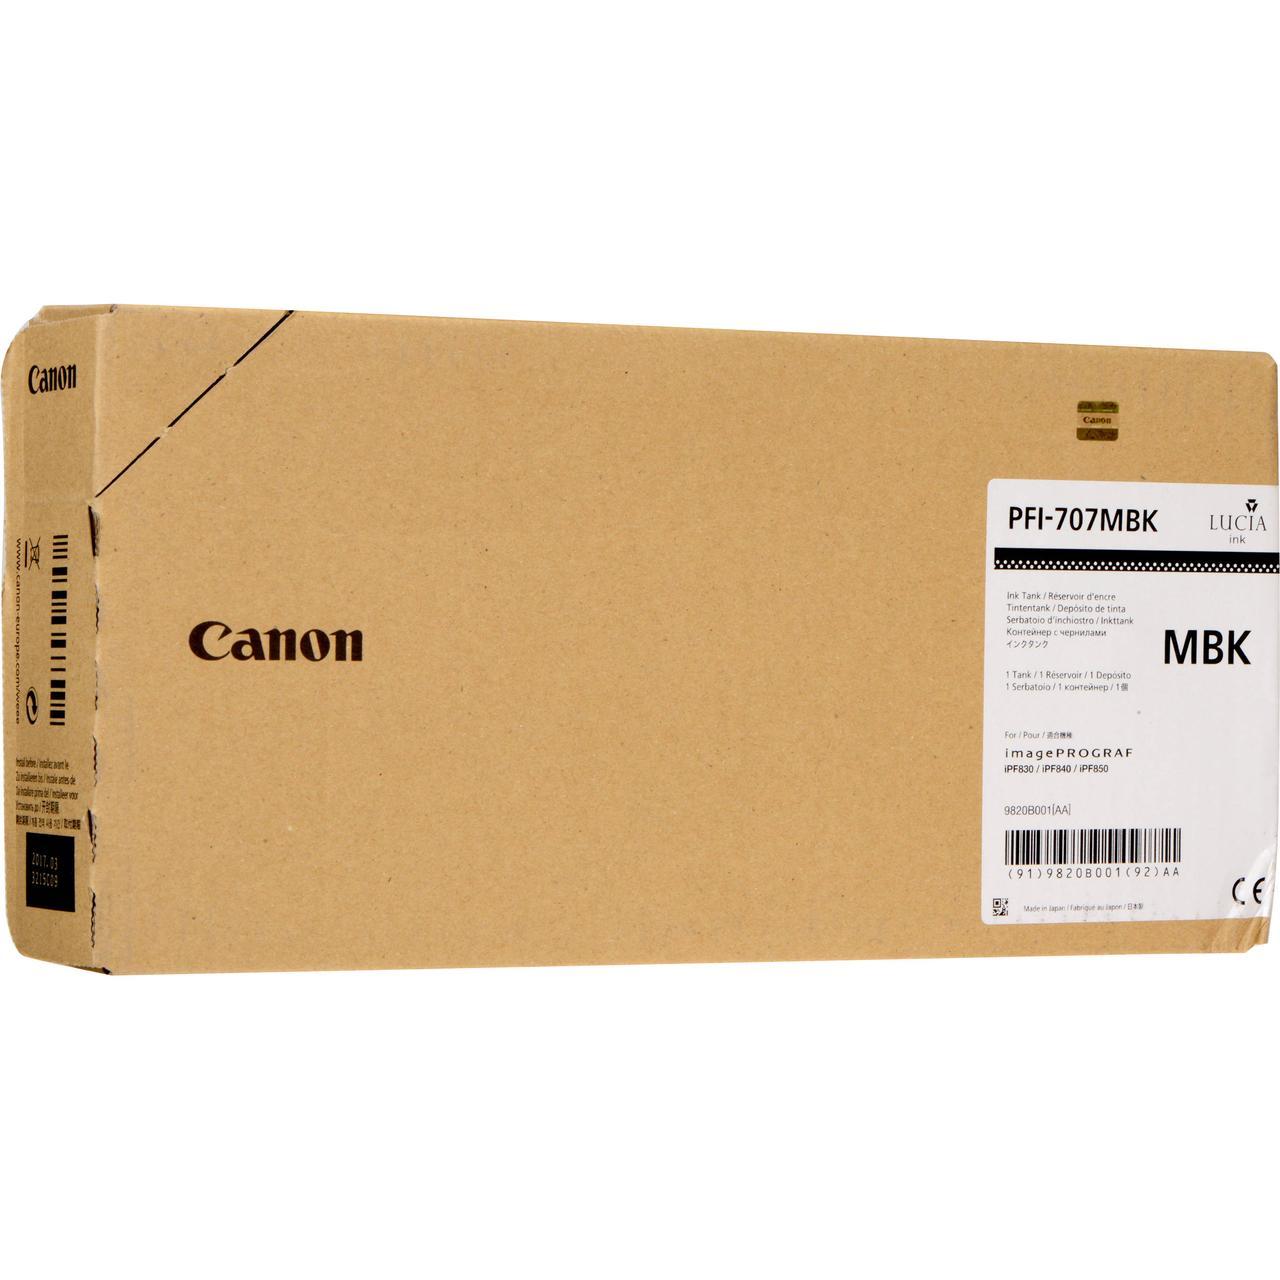 Картридж Canon PFI-707MBK для iPF830/840/850, Мatte Black, 700 мл